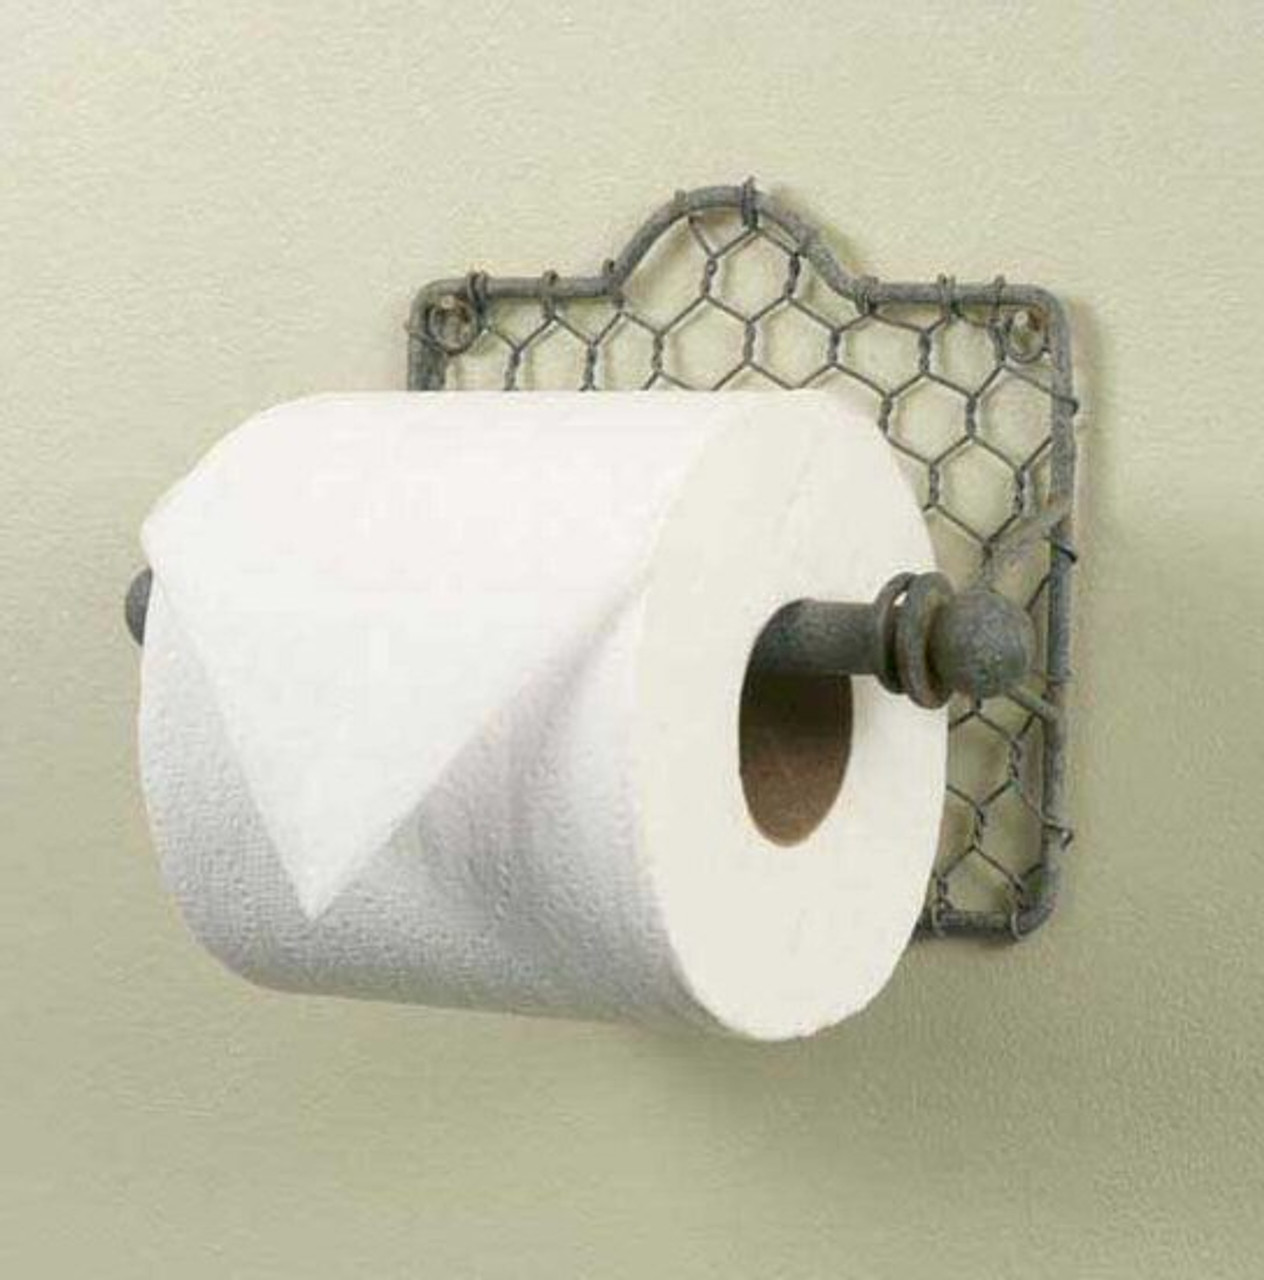 "Aluminium Toilet Roll Holder Bathroom Toilet For Commercial Use 5.5/"" or 6.5/"""